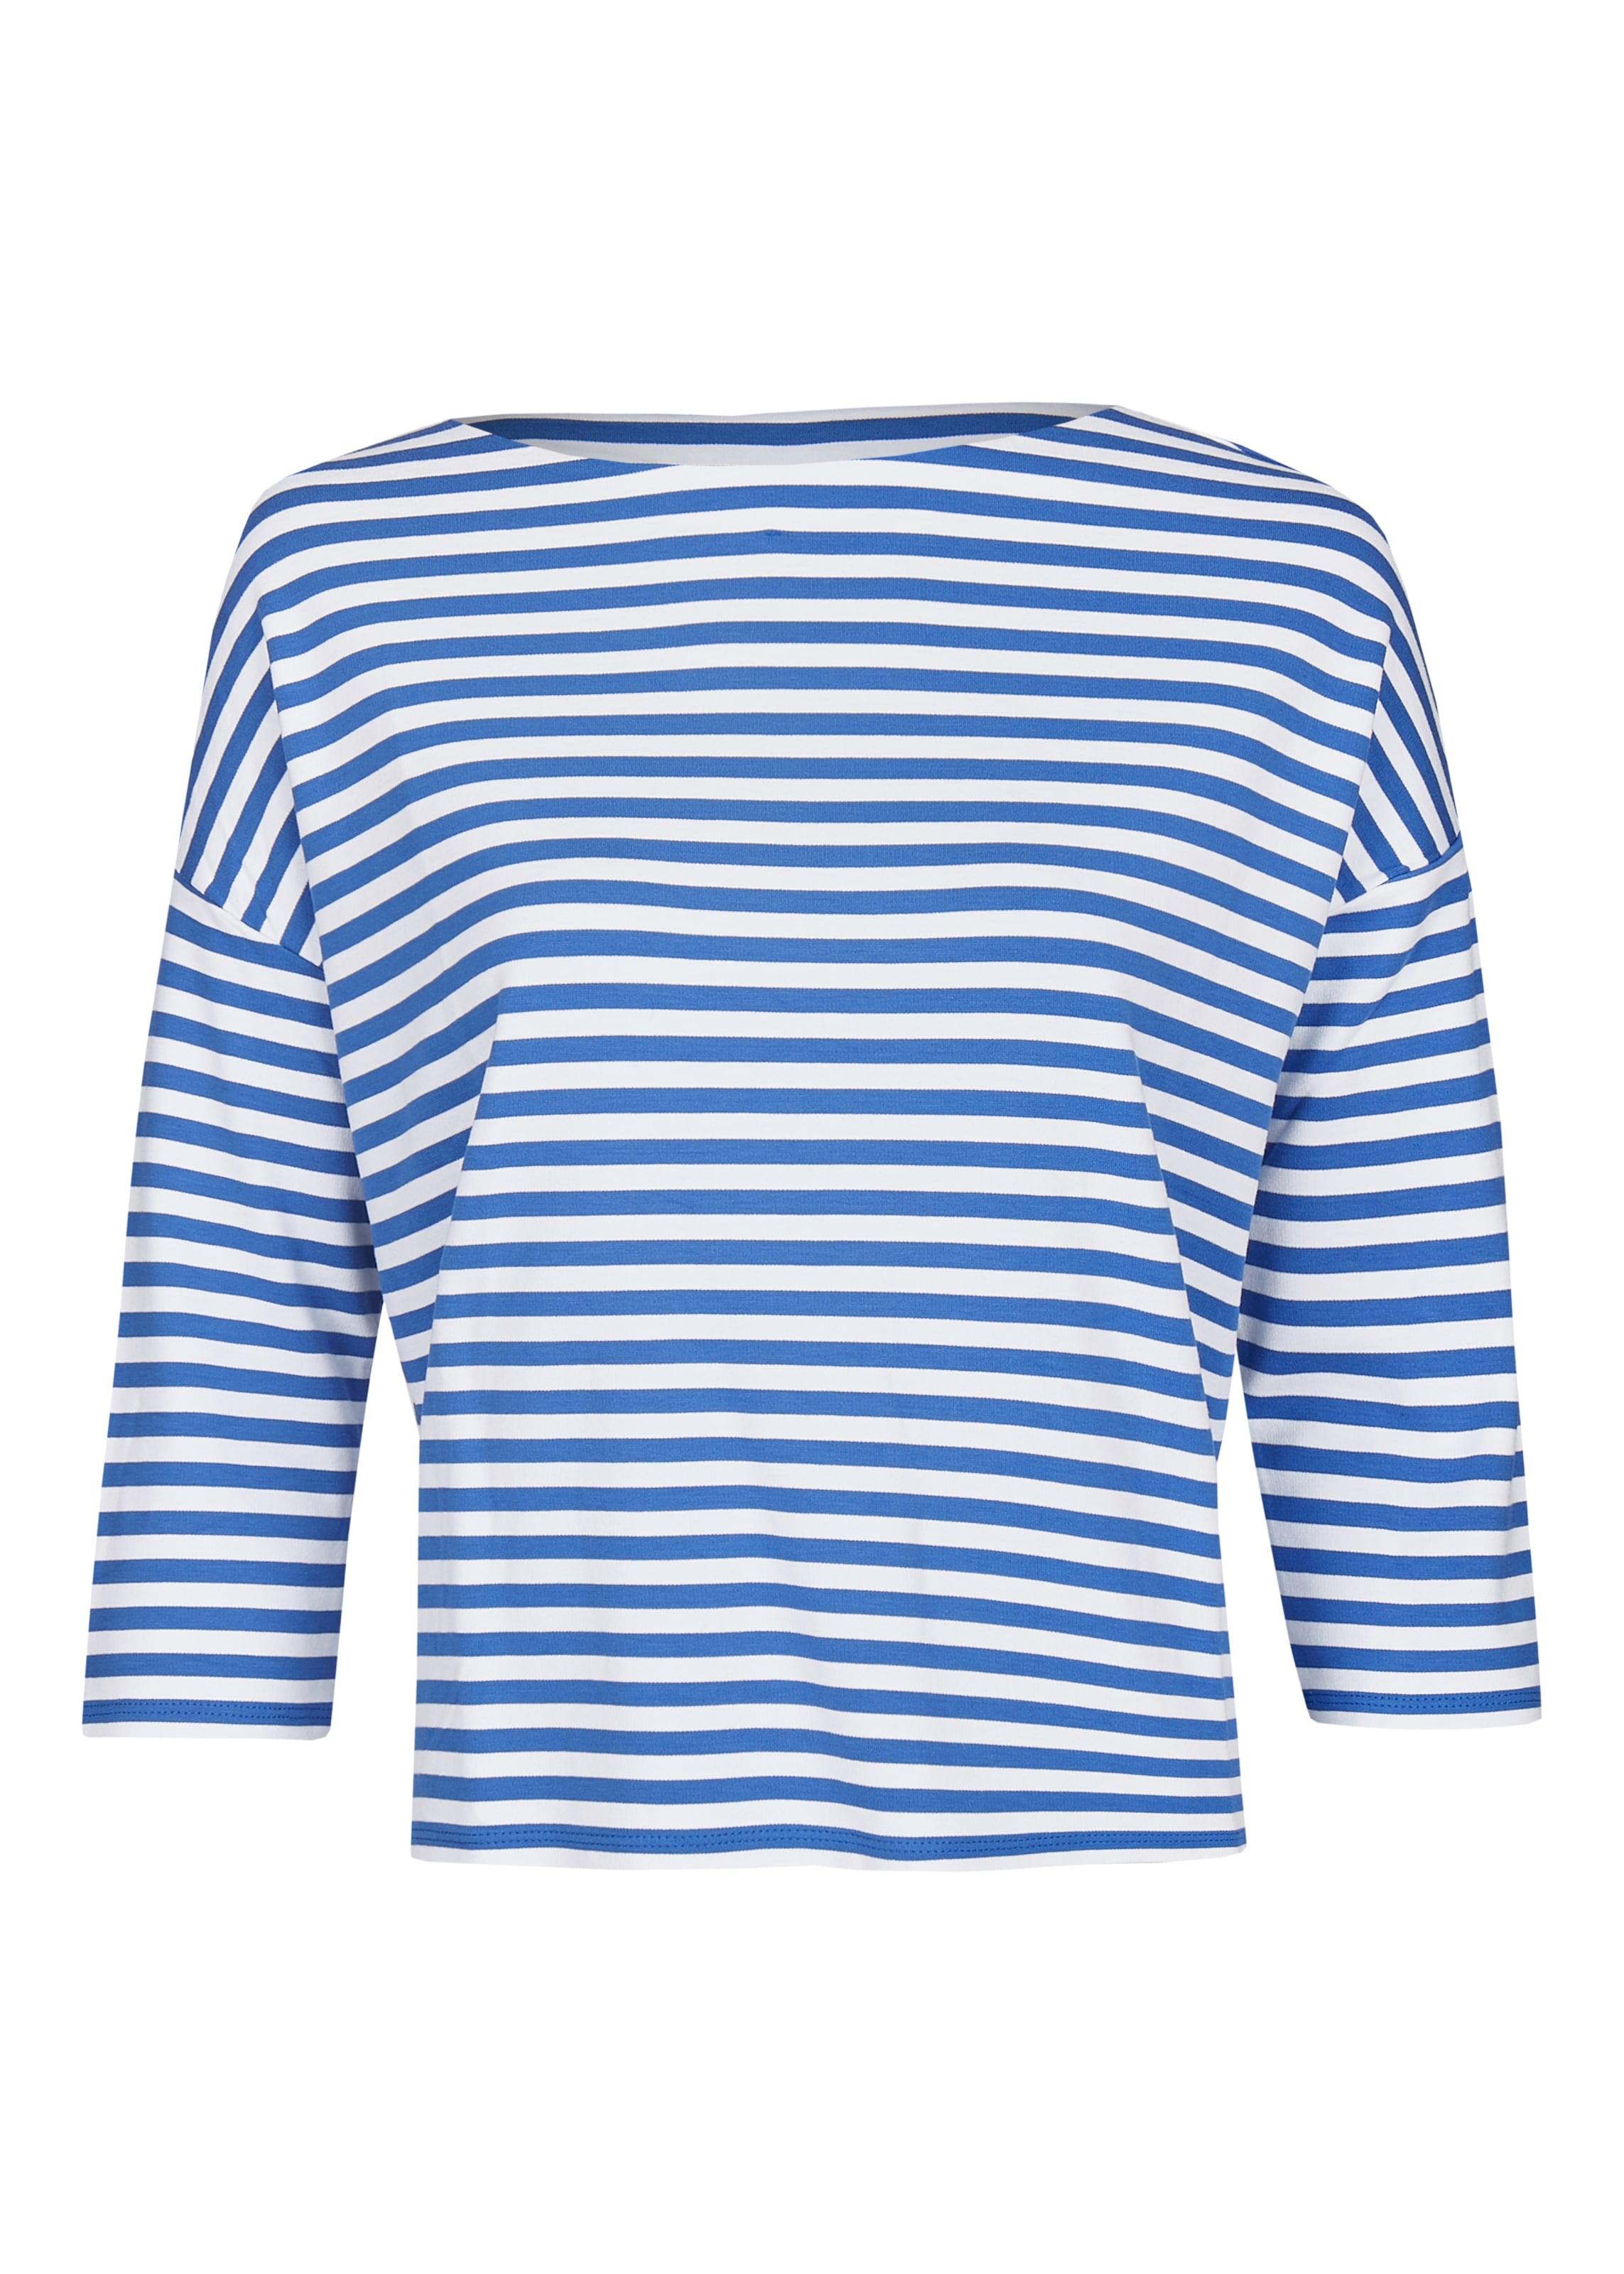 Shirt HellblauWeiß Daniel Hechter In Tc1uFlKJ3